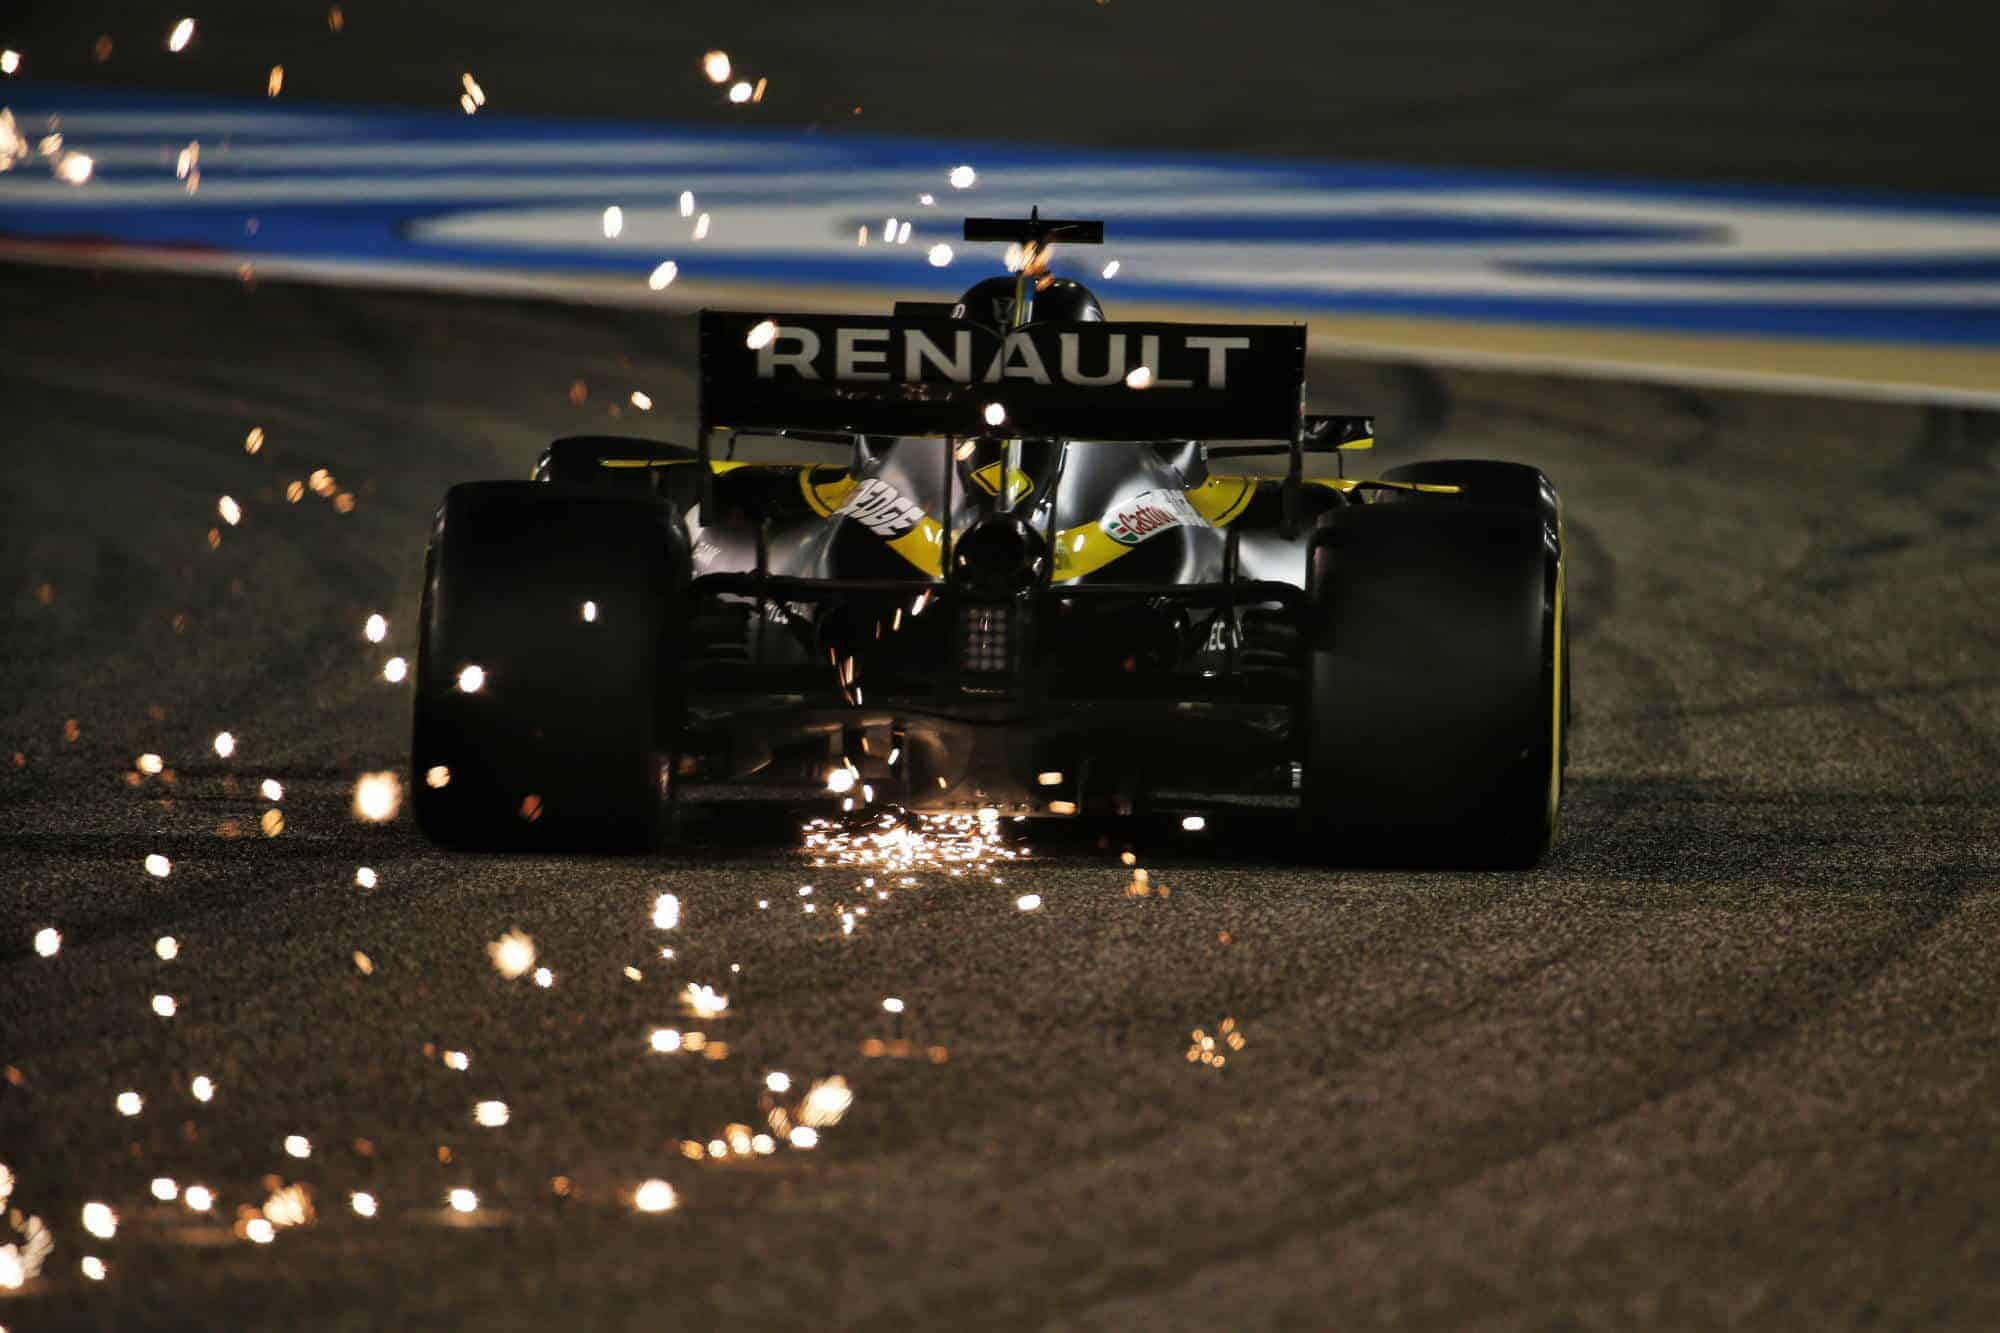 2020 Bahrain GP Ricciardo Renault rear end sparks Qualifying Photo Renault